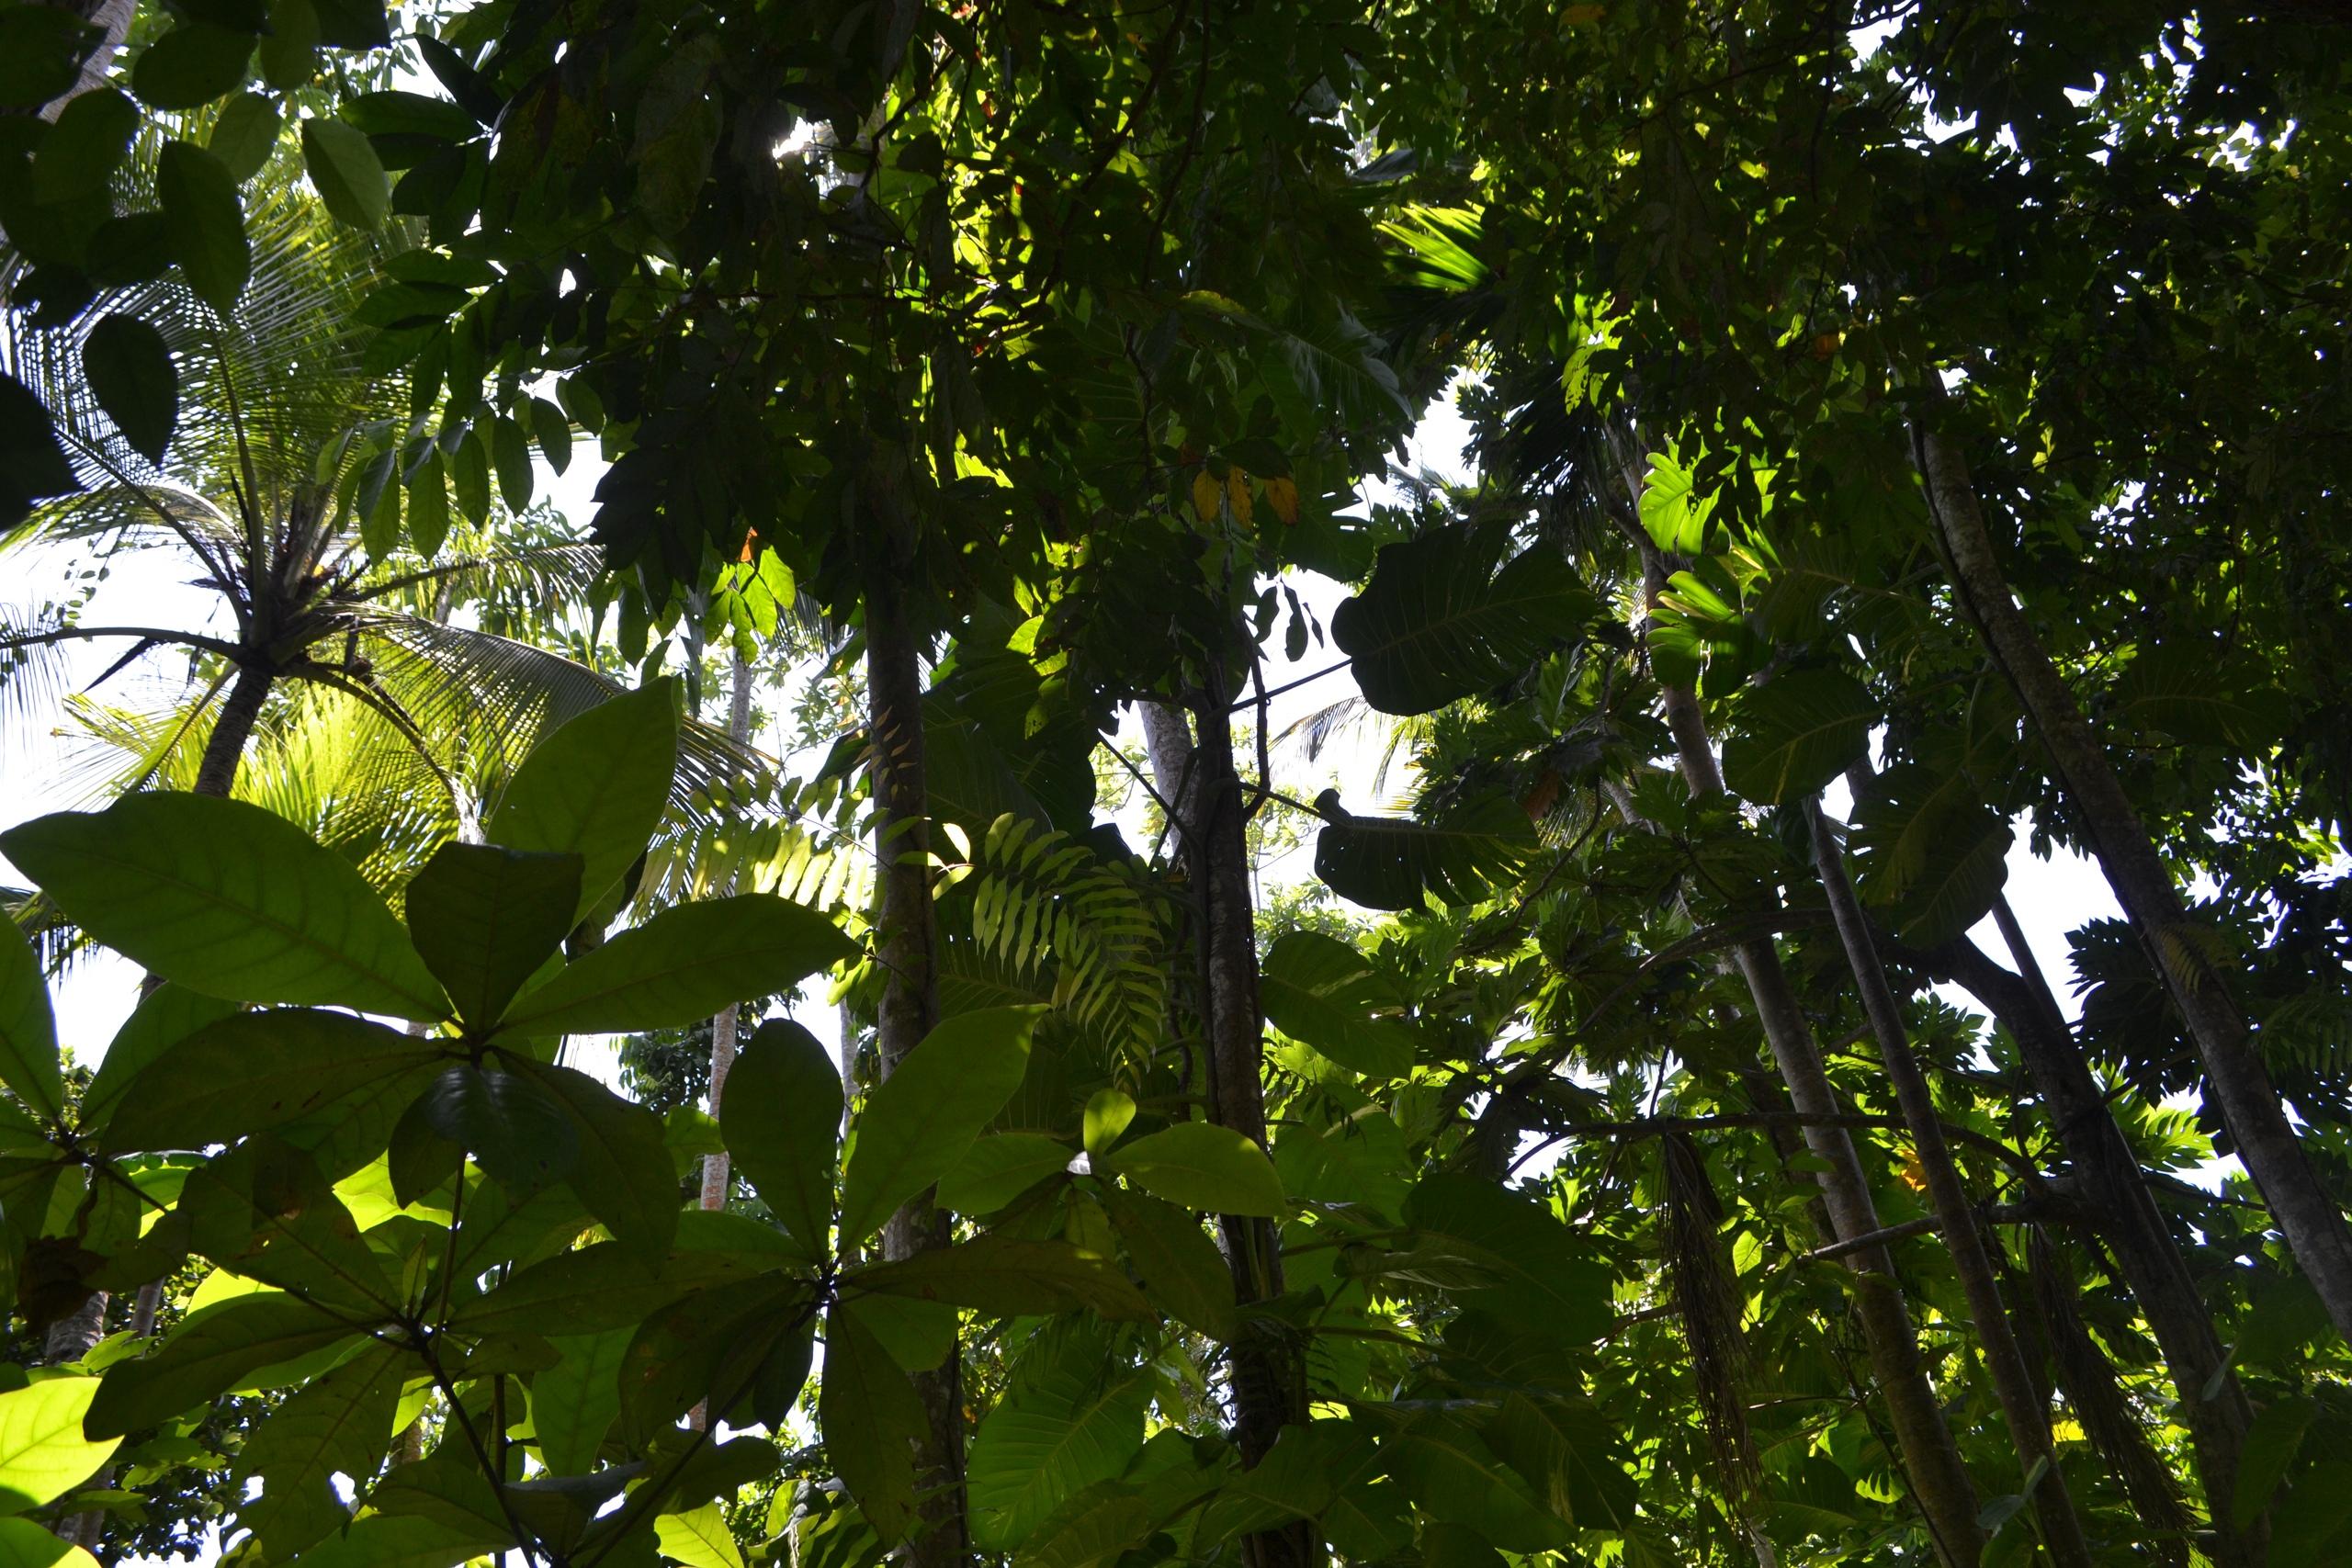 Шри Ланка (фото) - Страница 2 WKD5UbLY-t0